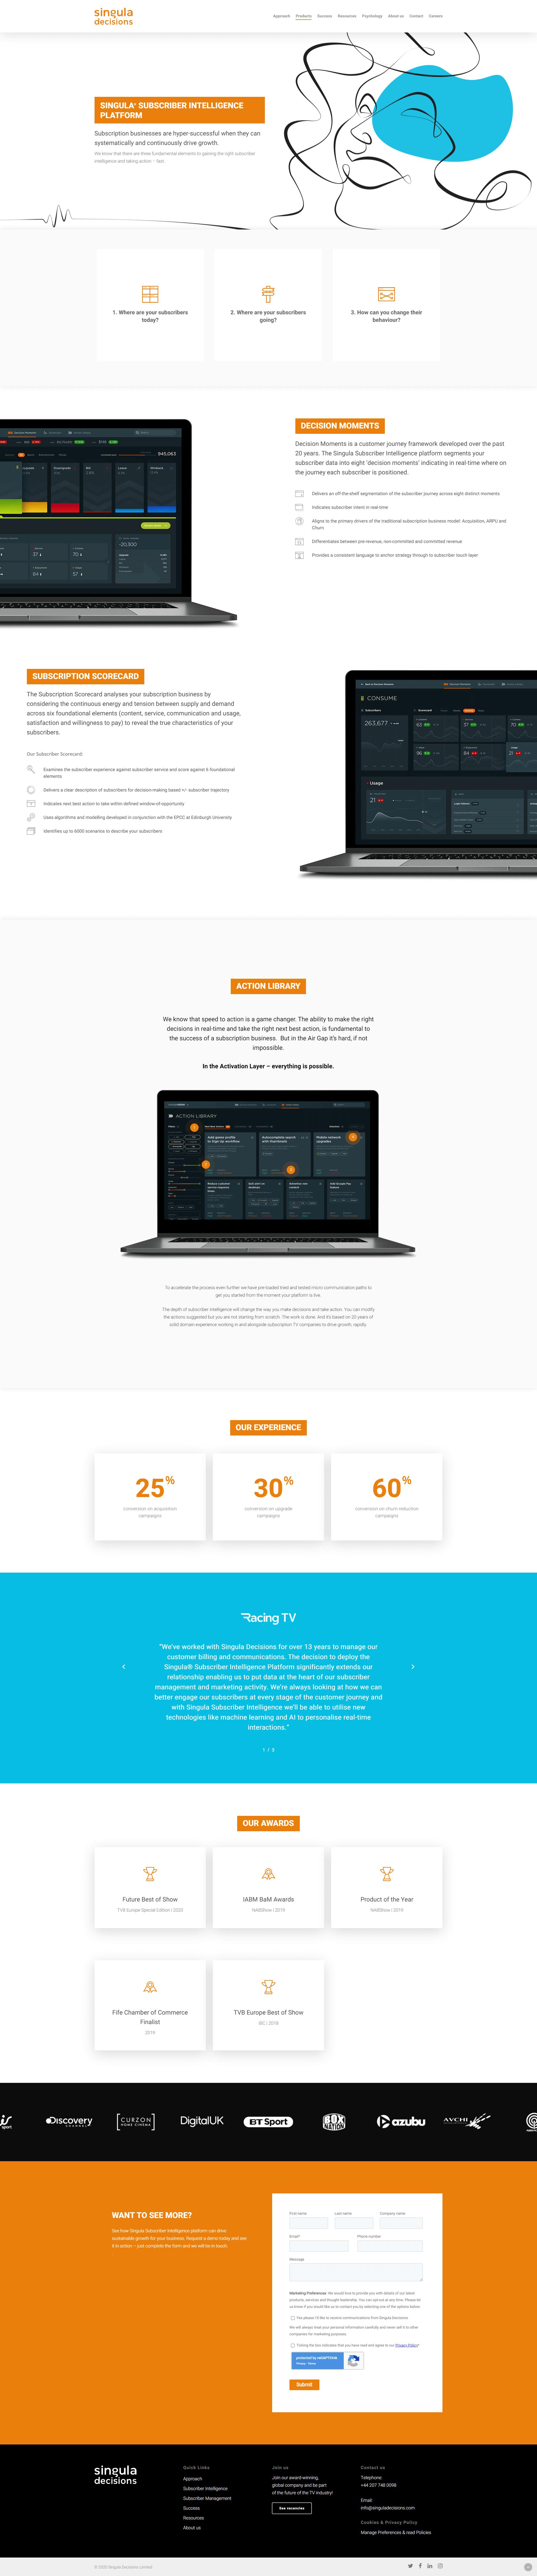 screencapture singuladecisions singula subscriber intelligence platform